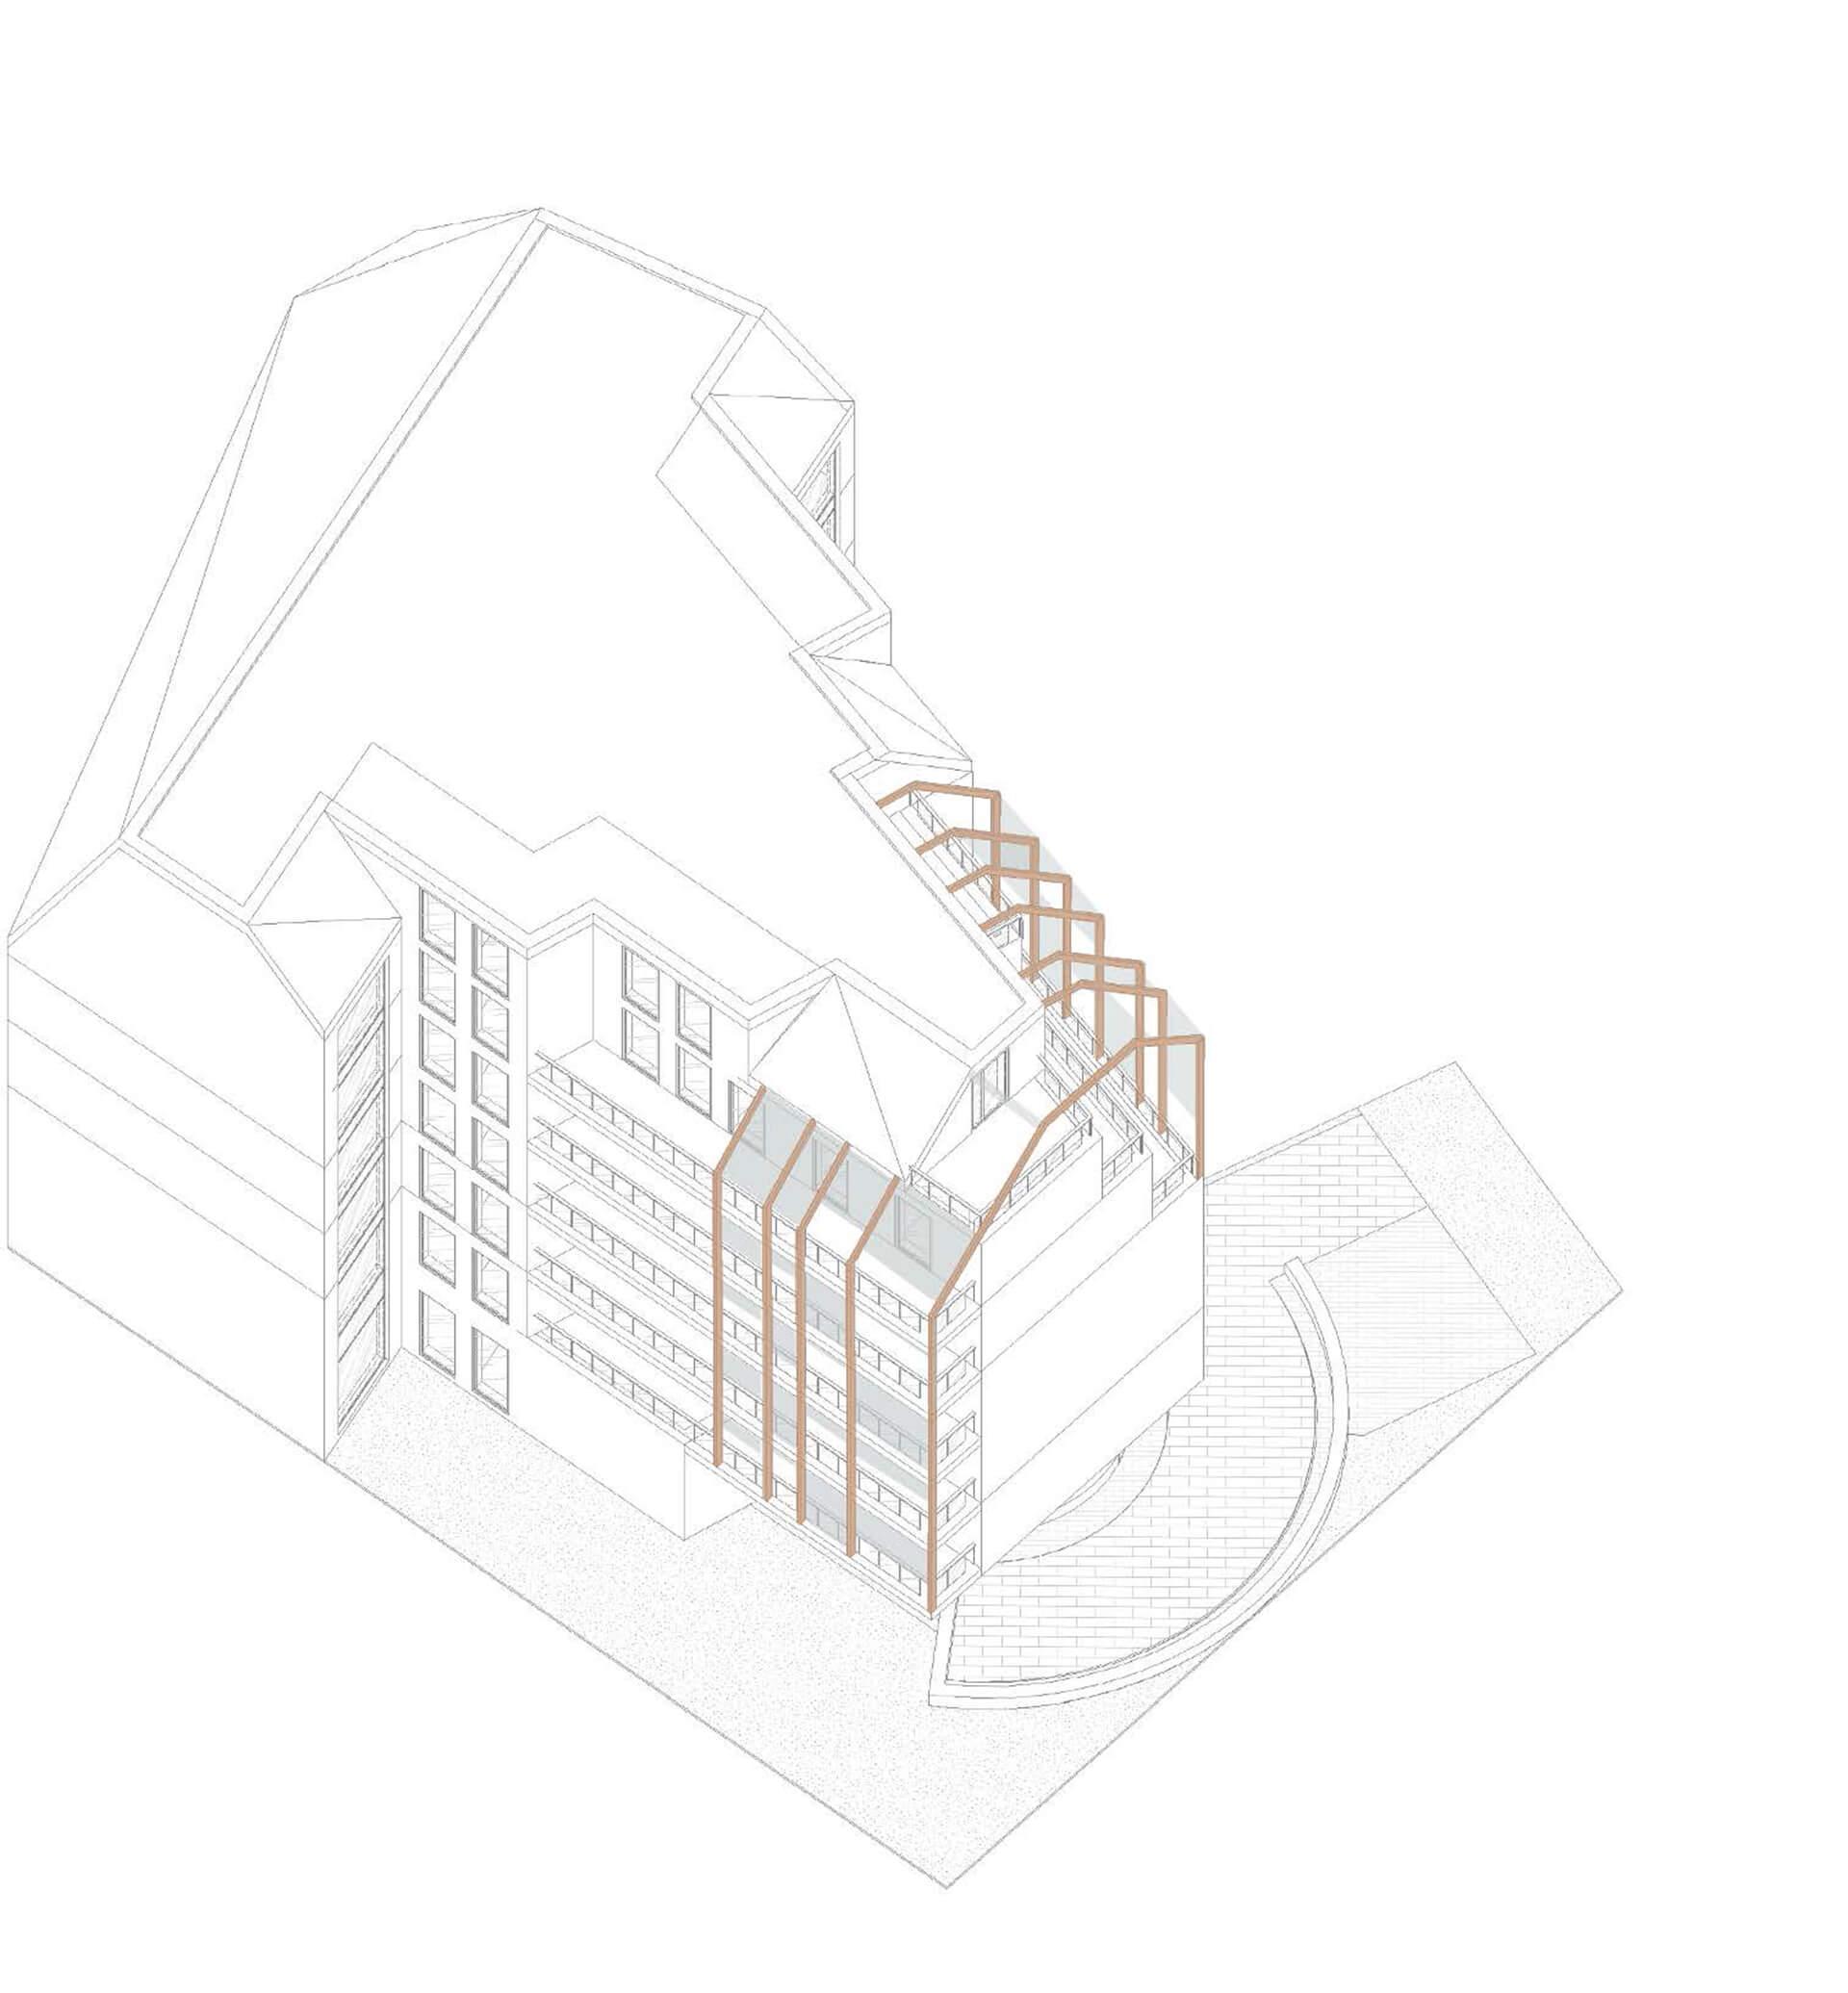 https://laagaarchitects.lv/wp-content/uploads/2019/11/03-02-6-KrB30.jpg